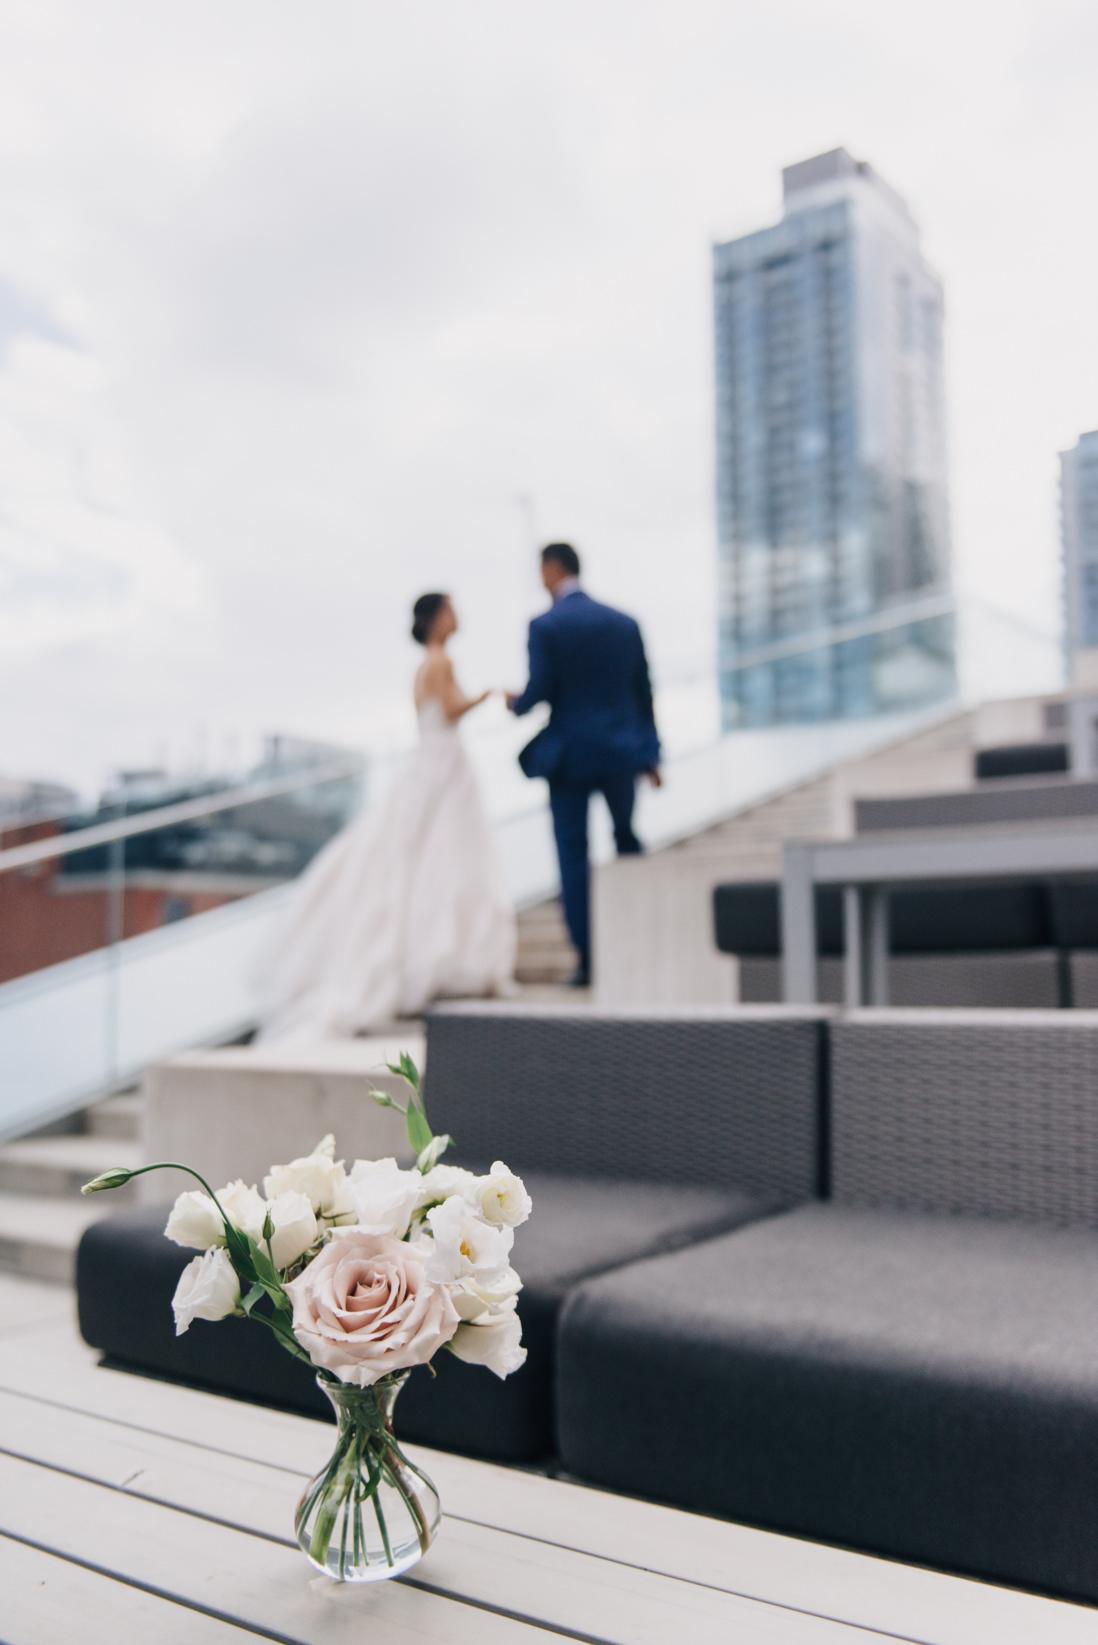 bride and groom walking up steps on malaparte terrace bell tiff lightbox toronto